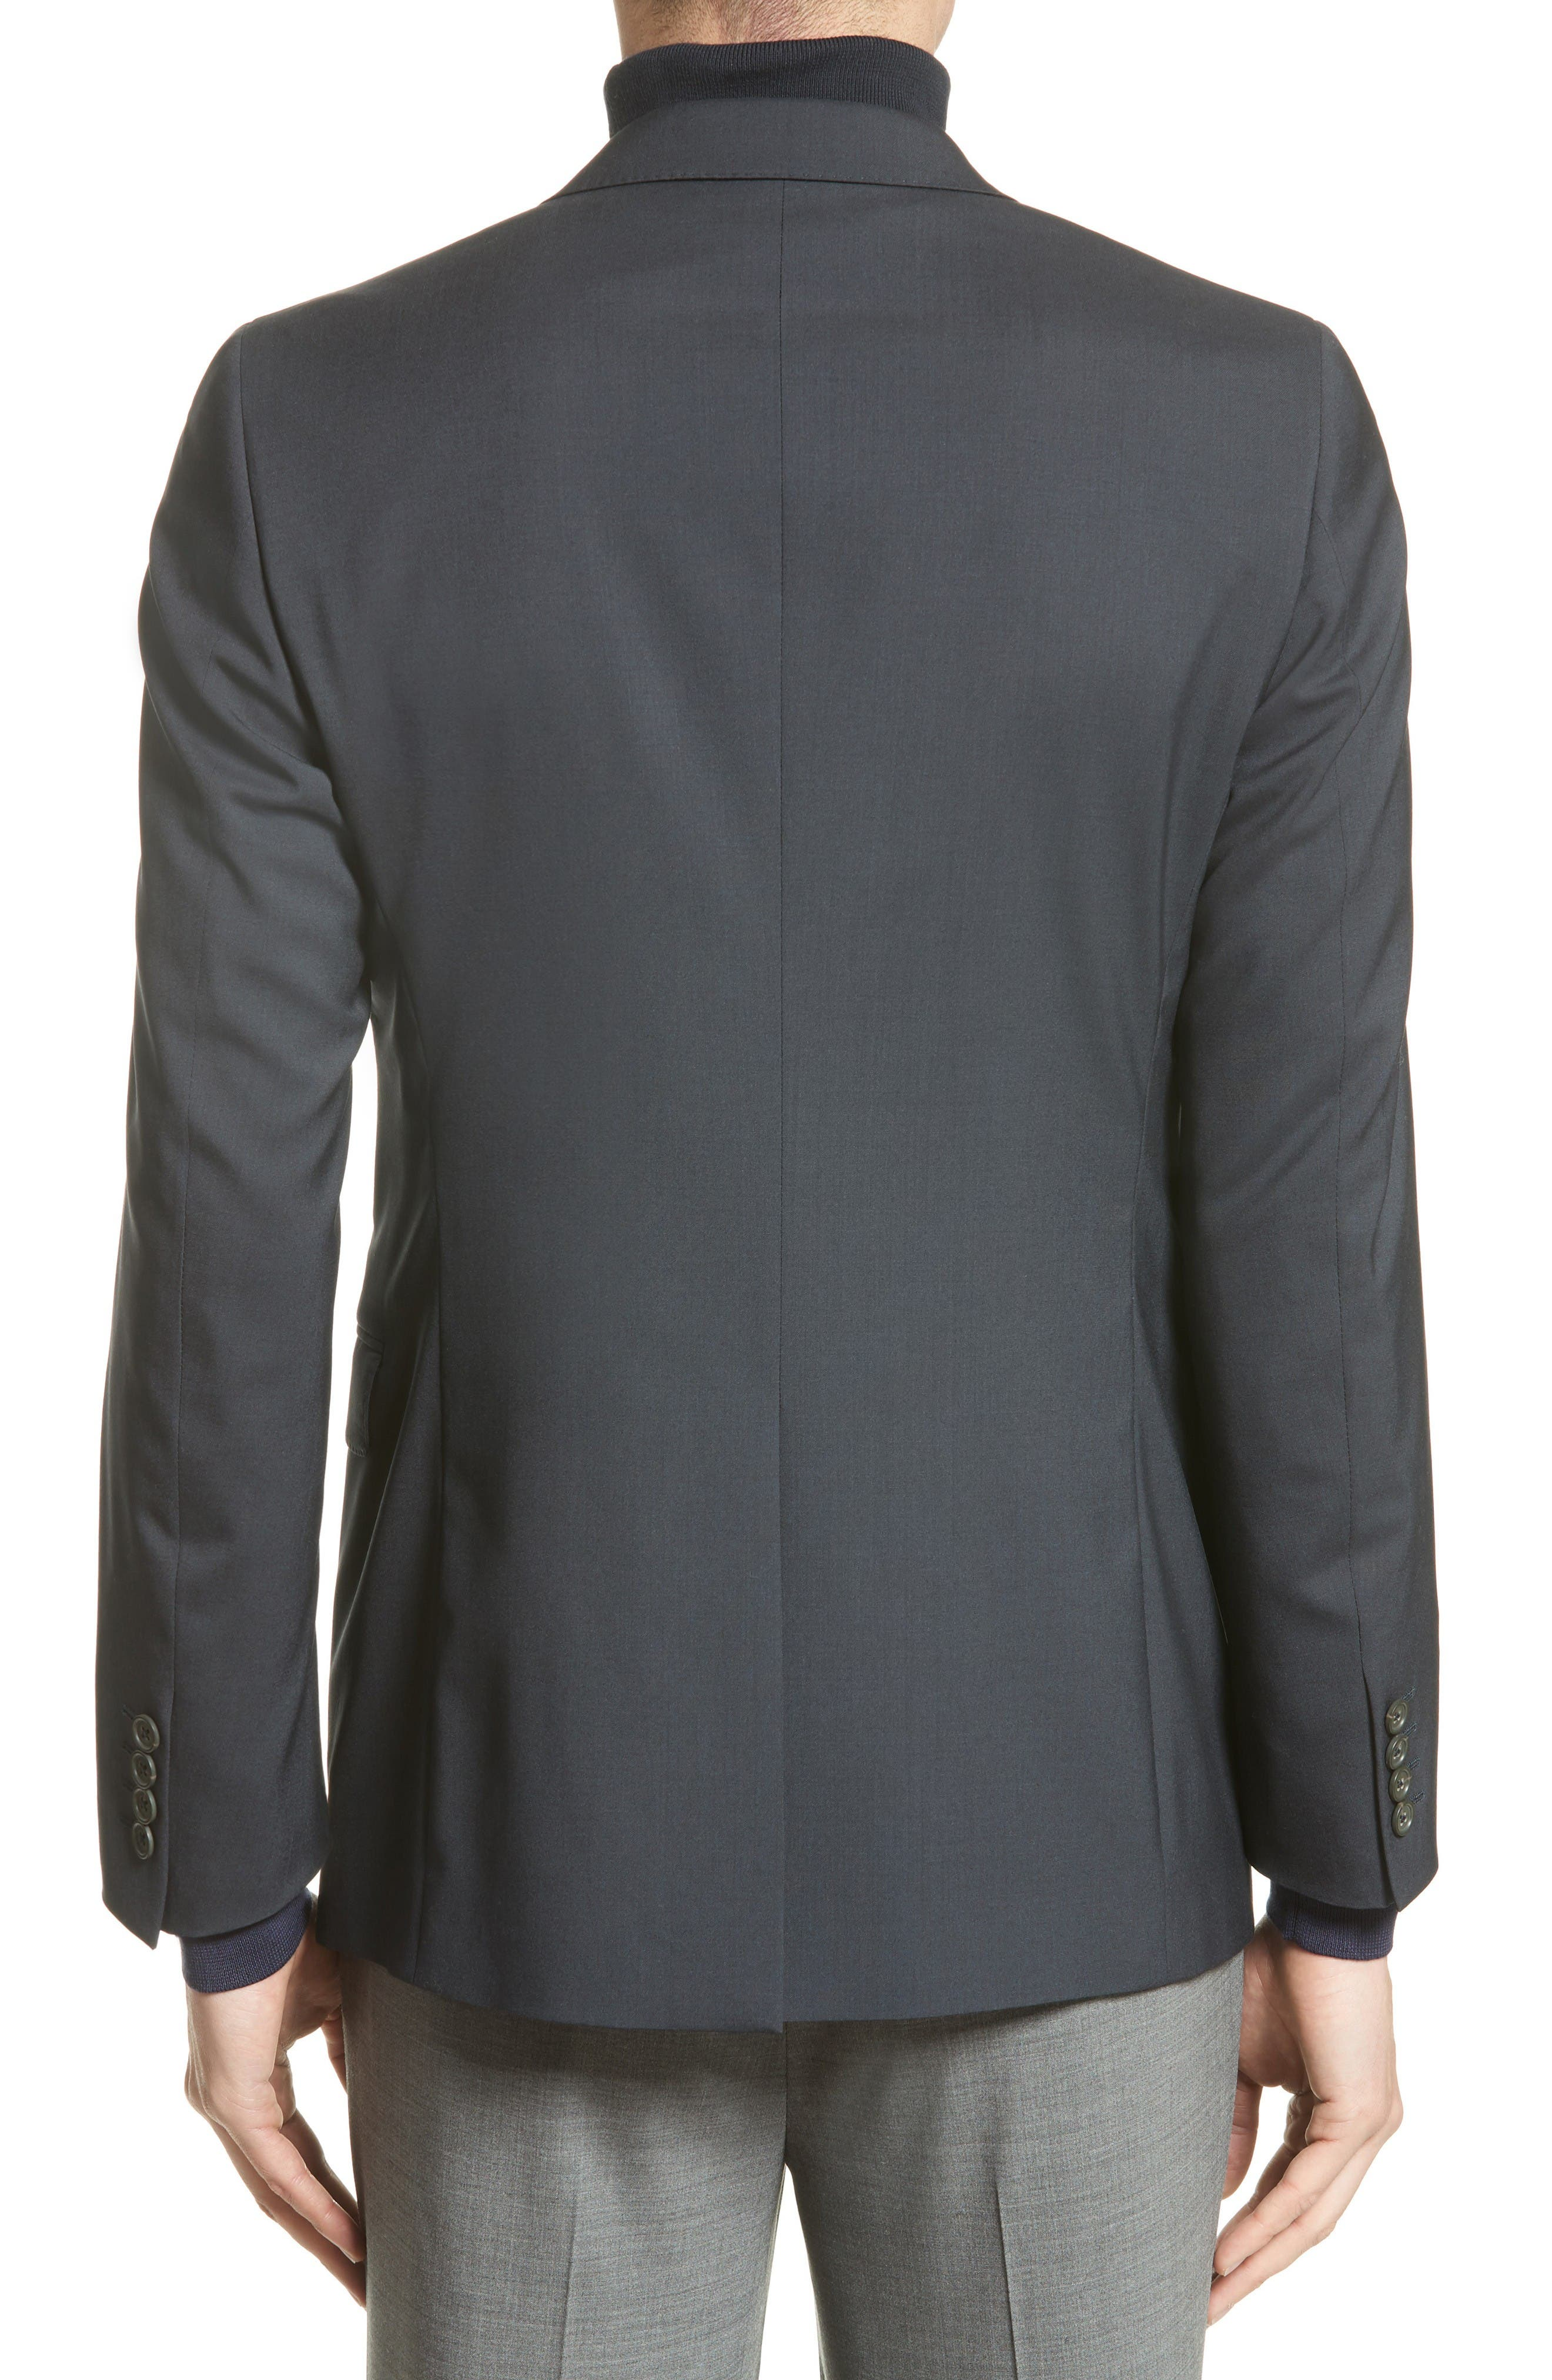 Tropical Wool Suit Jacket,                             Alternate thumbnail 11, color,                             NAVY